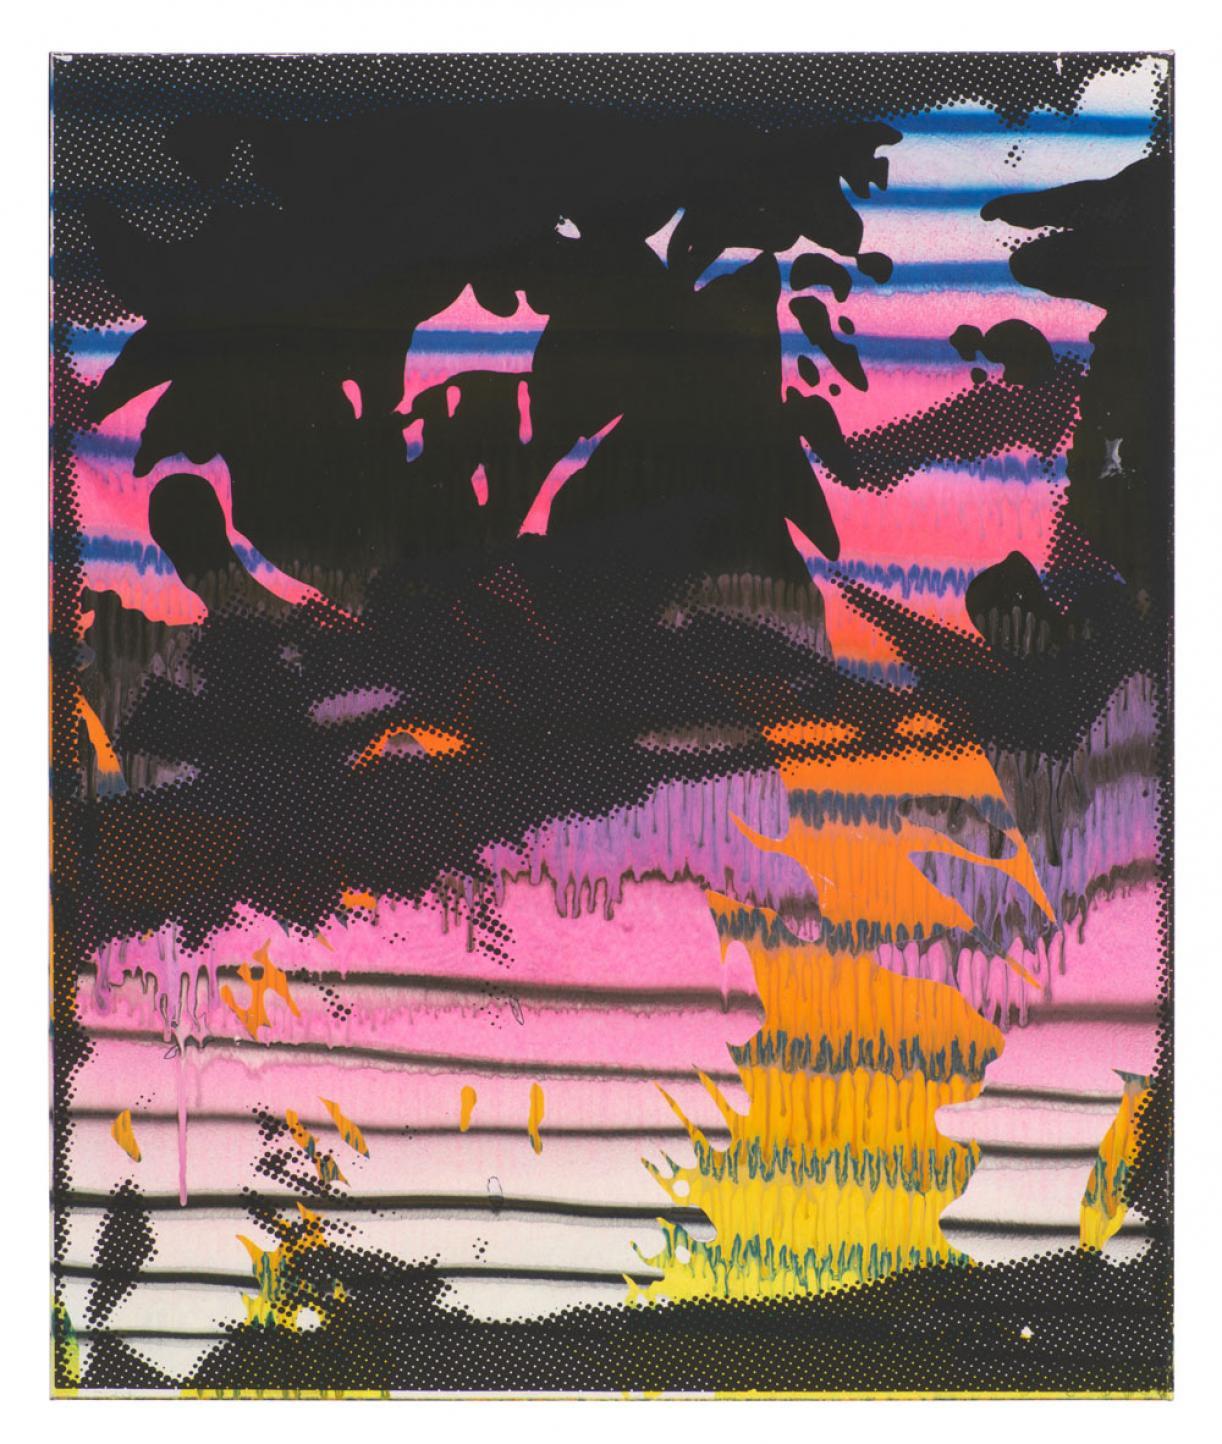 Christine Streuli, Gorge, 2018, Mixed media on canvas, 120x100cm, Unique